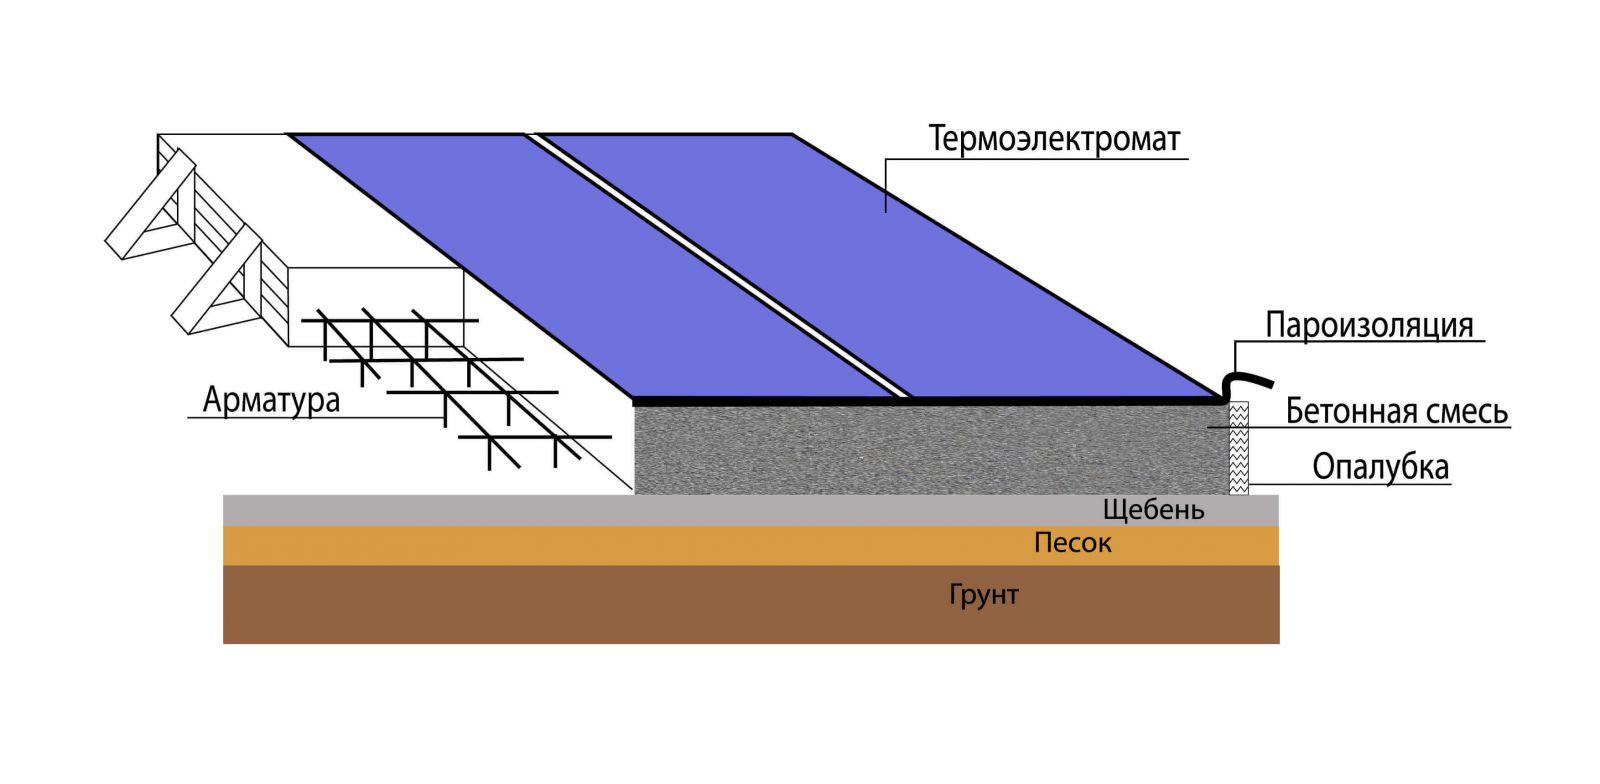 Маты для бетона характеристика растворы цементные марка 100